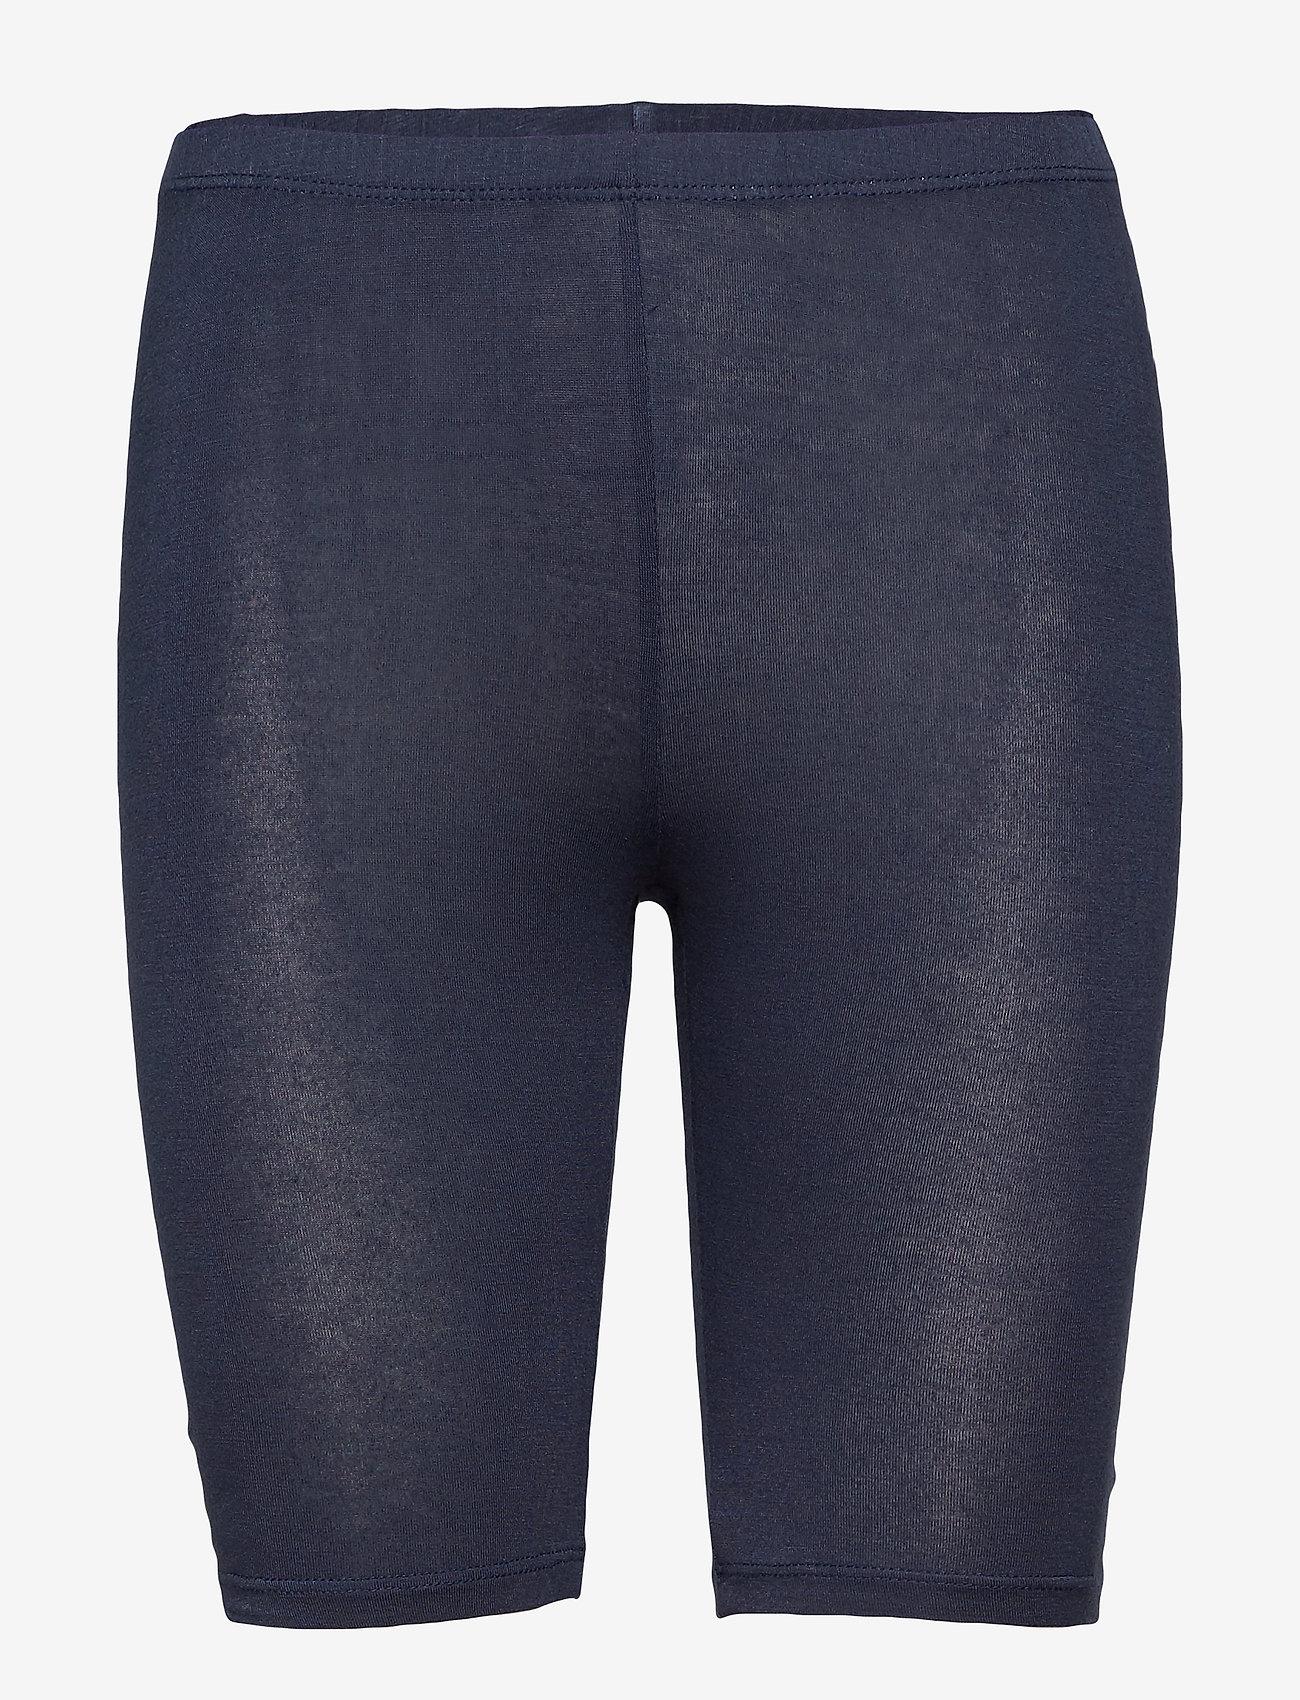 Decoy - DECOY shorts viscose stretch - bottoms - navy